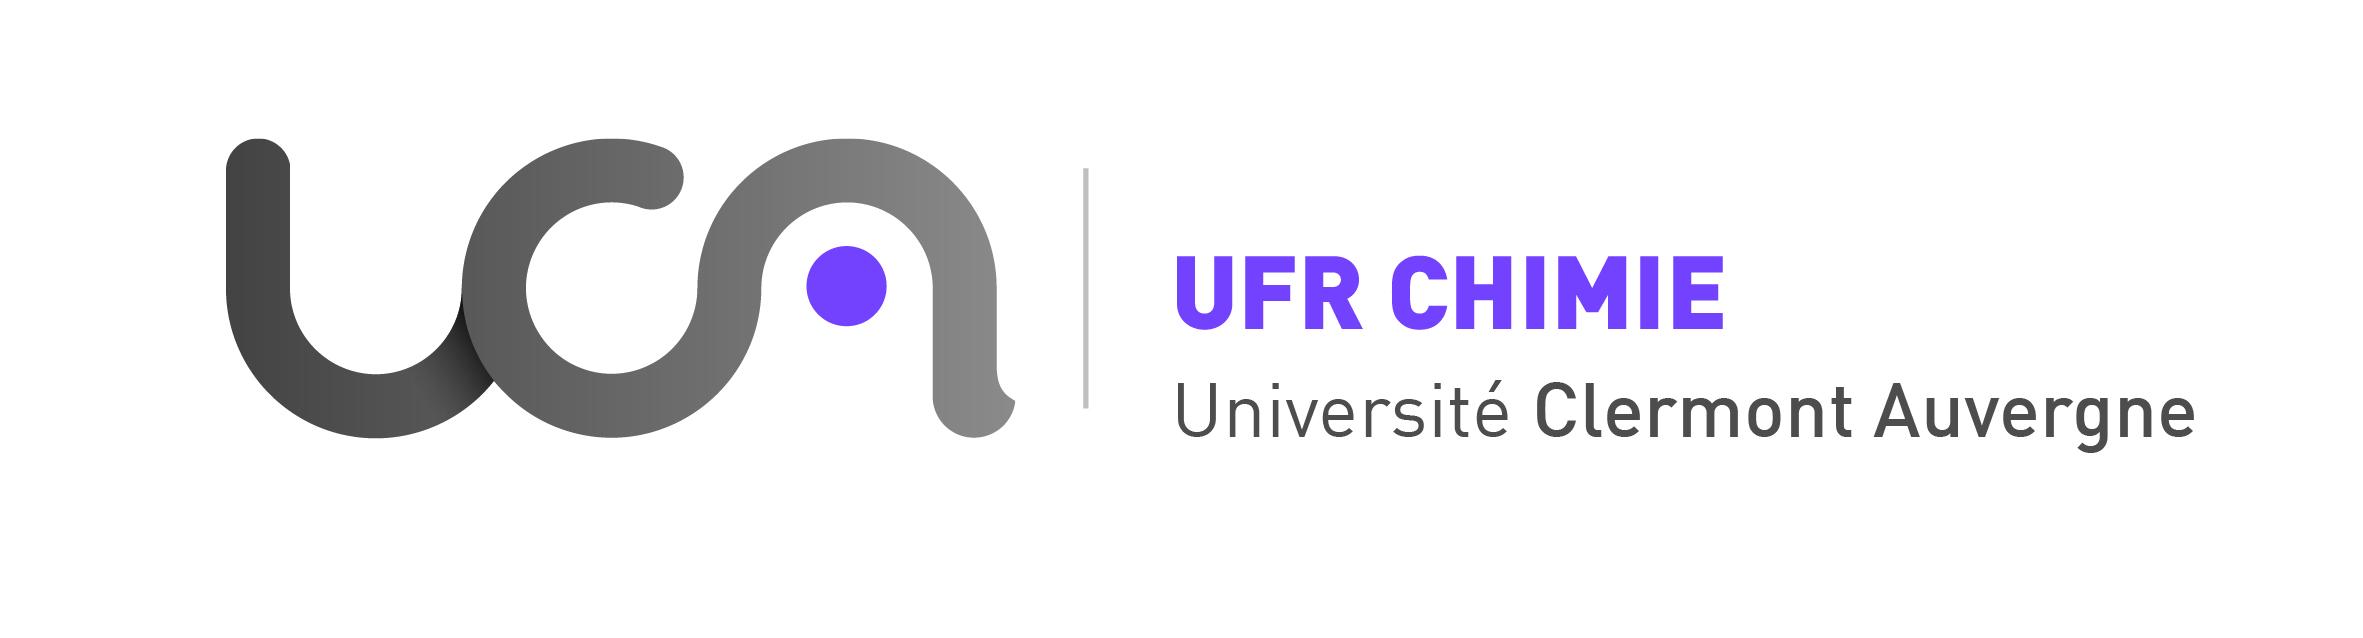 UFR Chimie